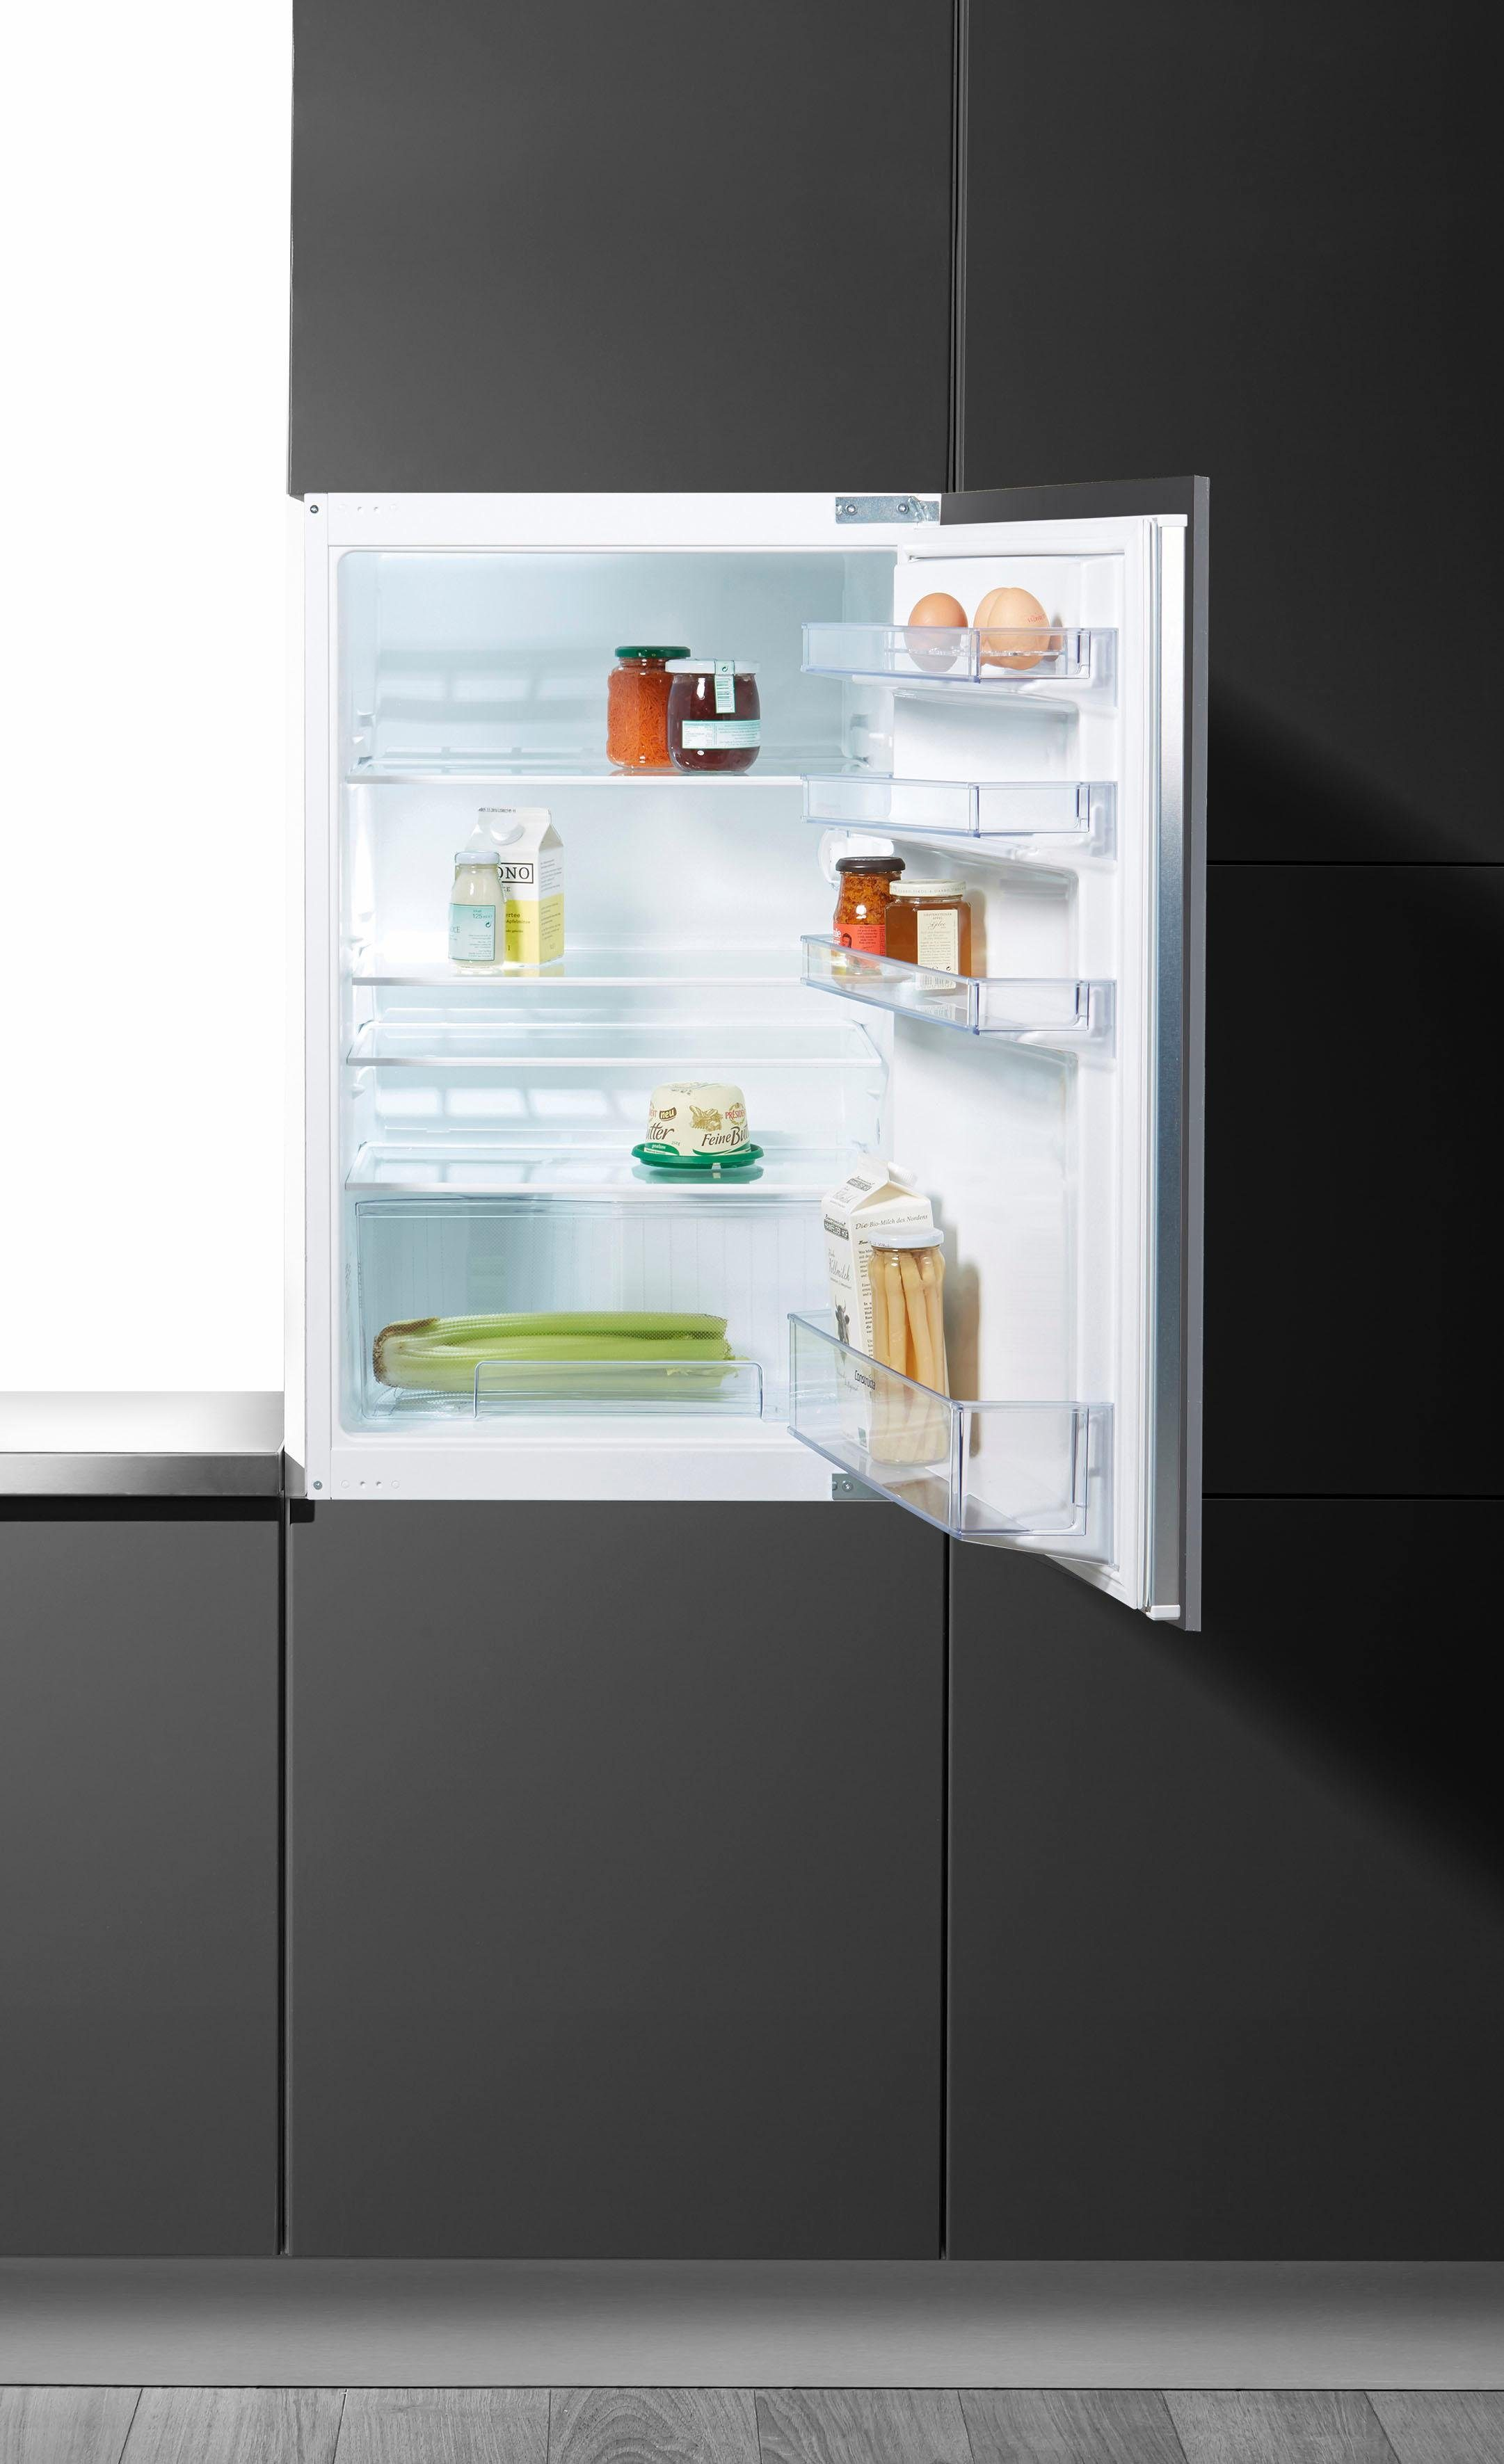 Constructa Integrierbarer Einbaukühlschrank CK60244, Energieklasse A+, 87,4 cm hoch